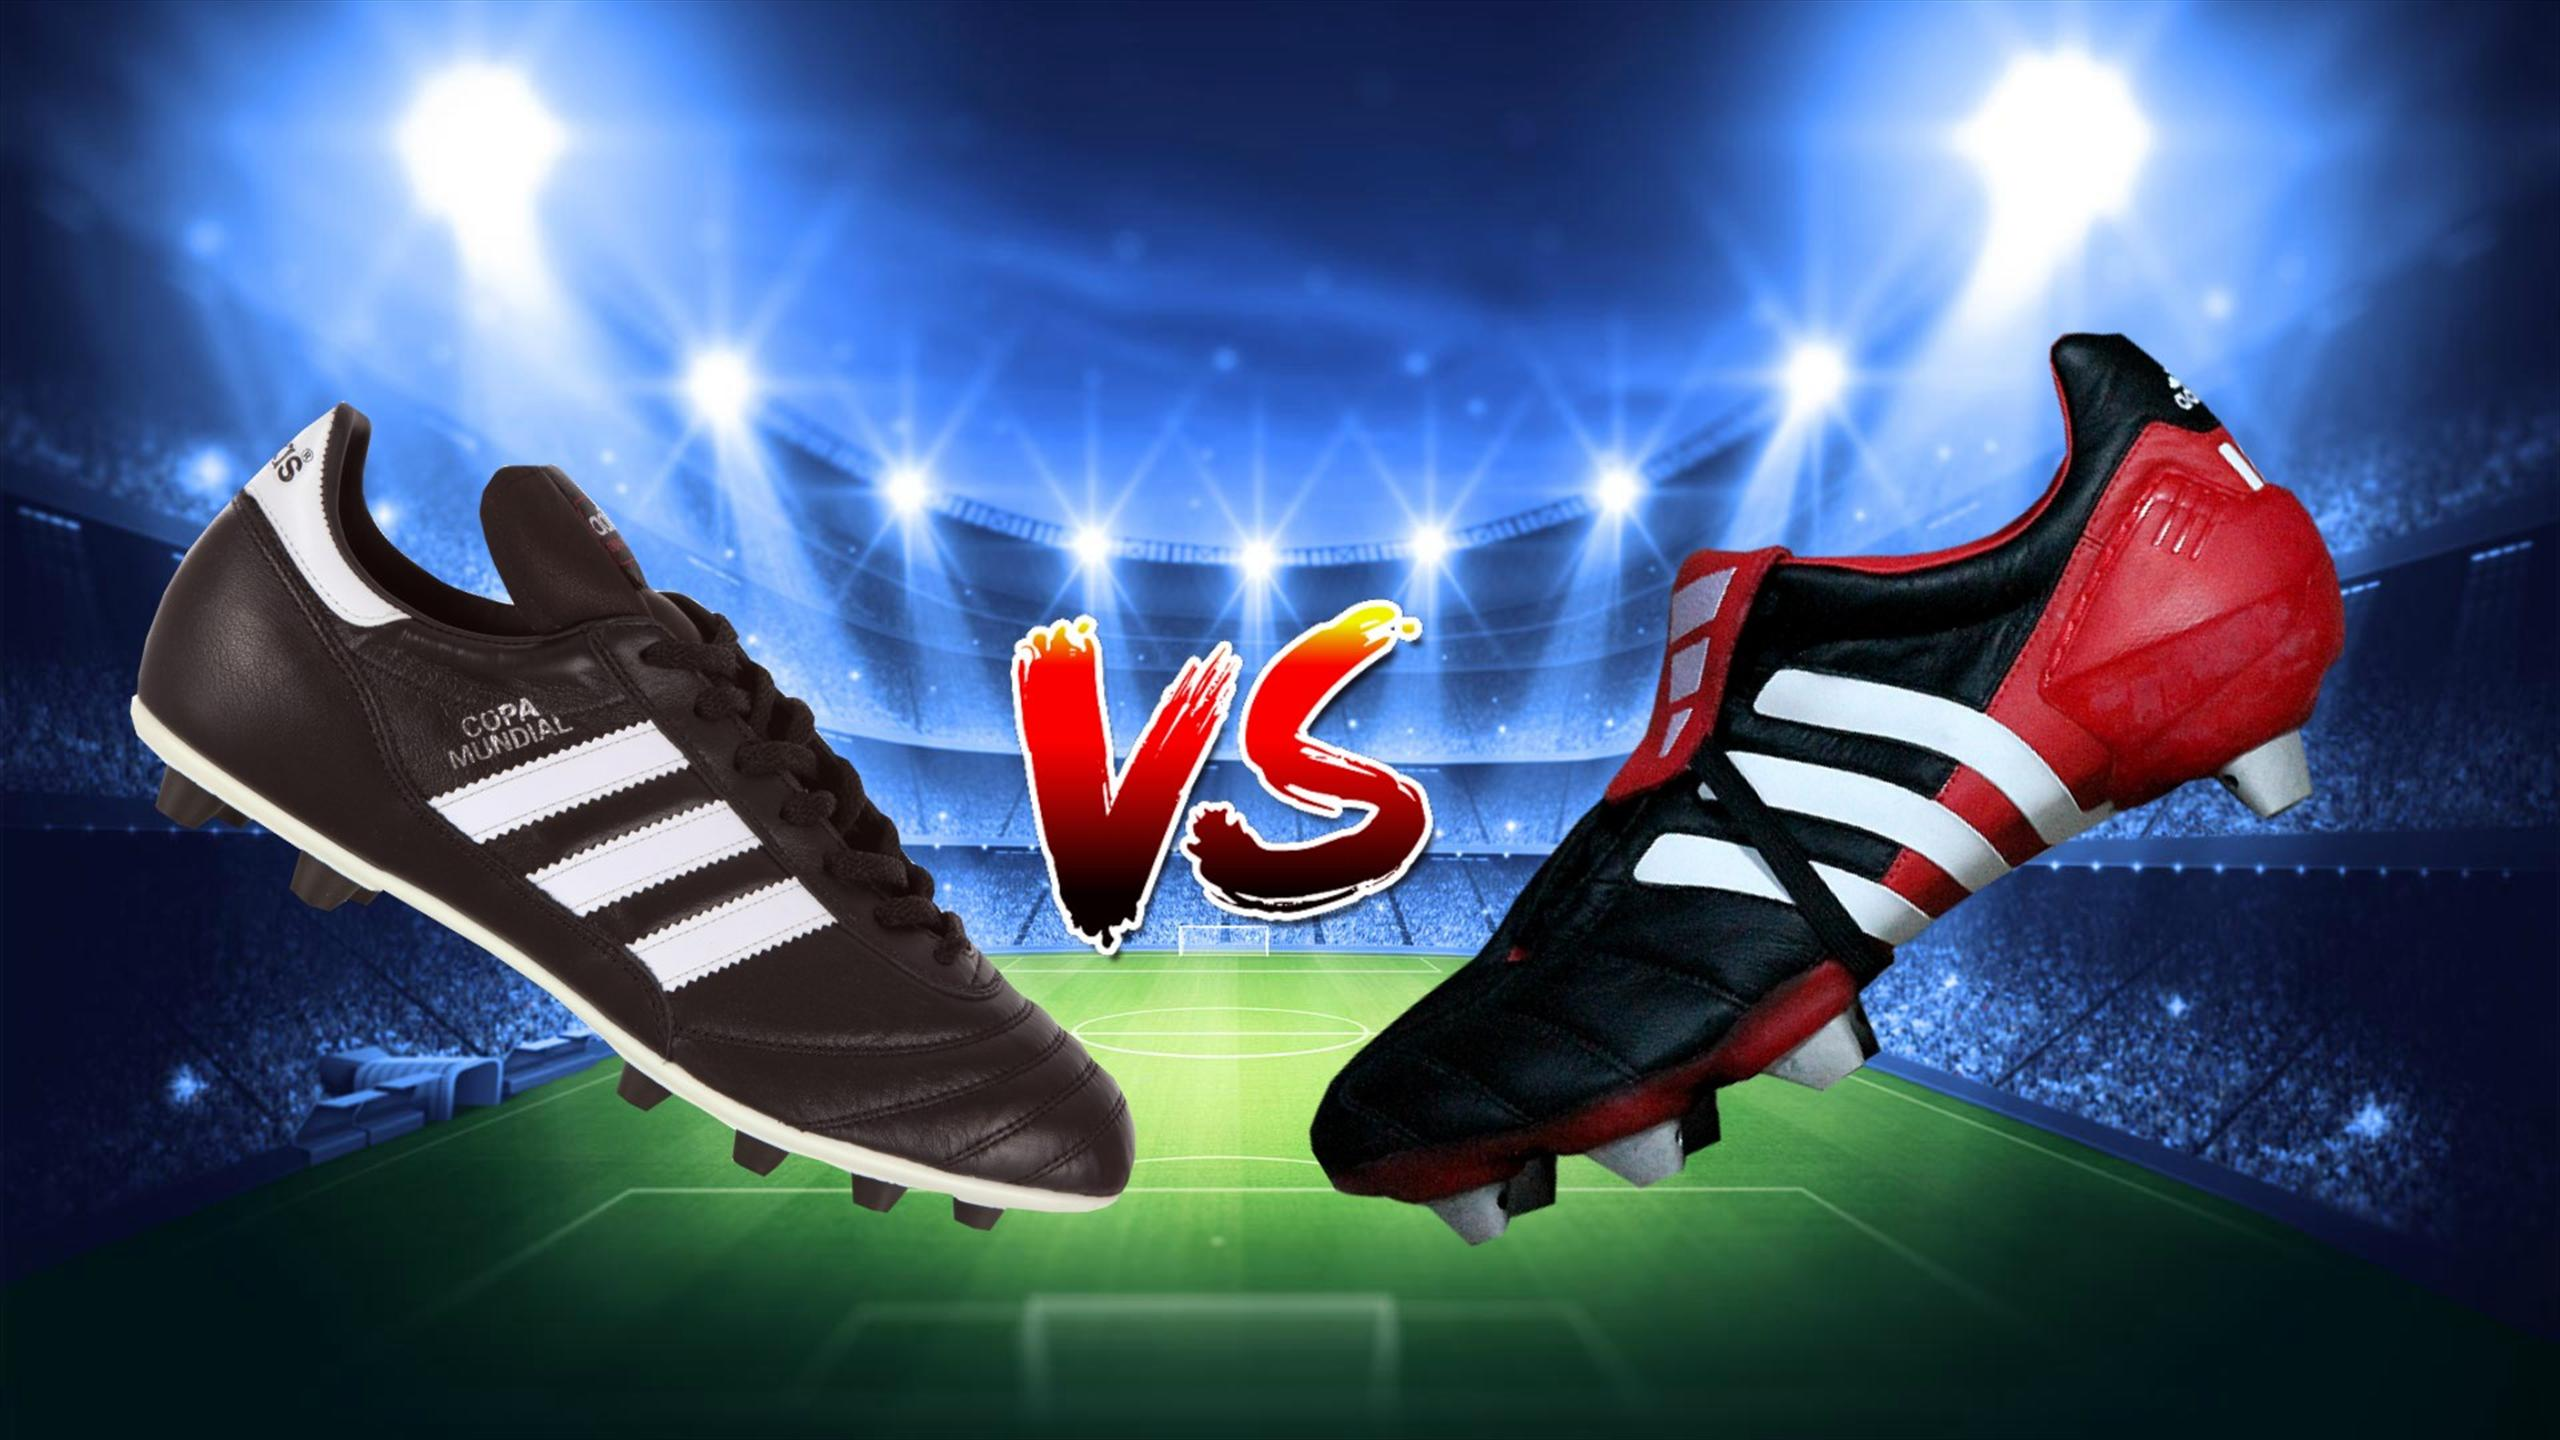 hot sale online aa645 918d5 ... discount une finale adidas copa mundial vs predator mania élisez la chaussure  de football ultime football